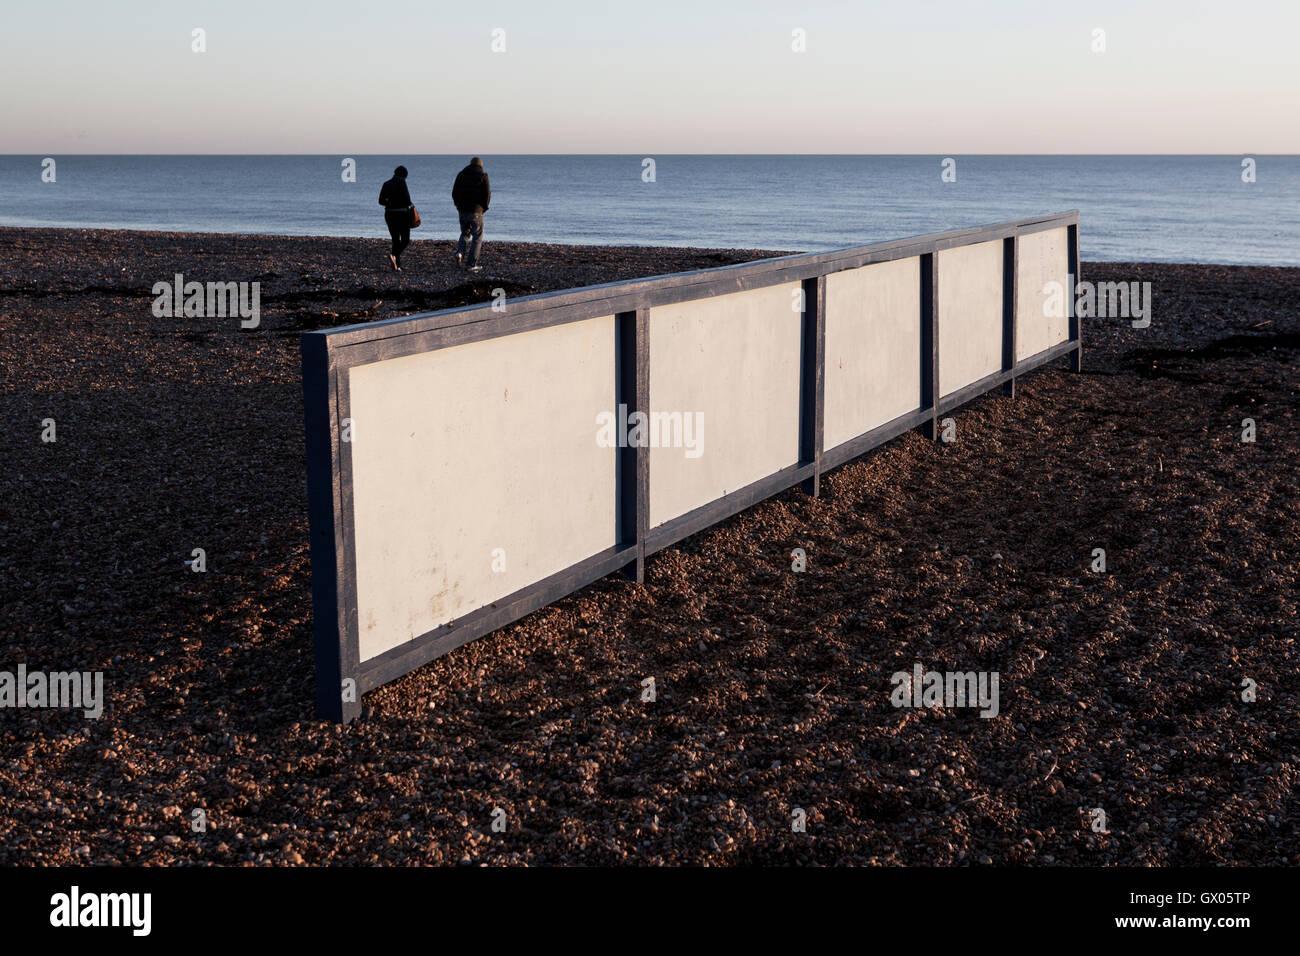 People walking along the seashore. Color photograph. - Stock Image